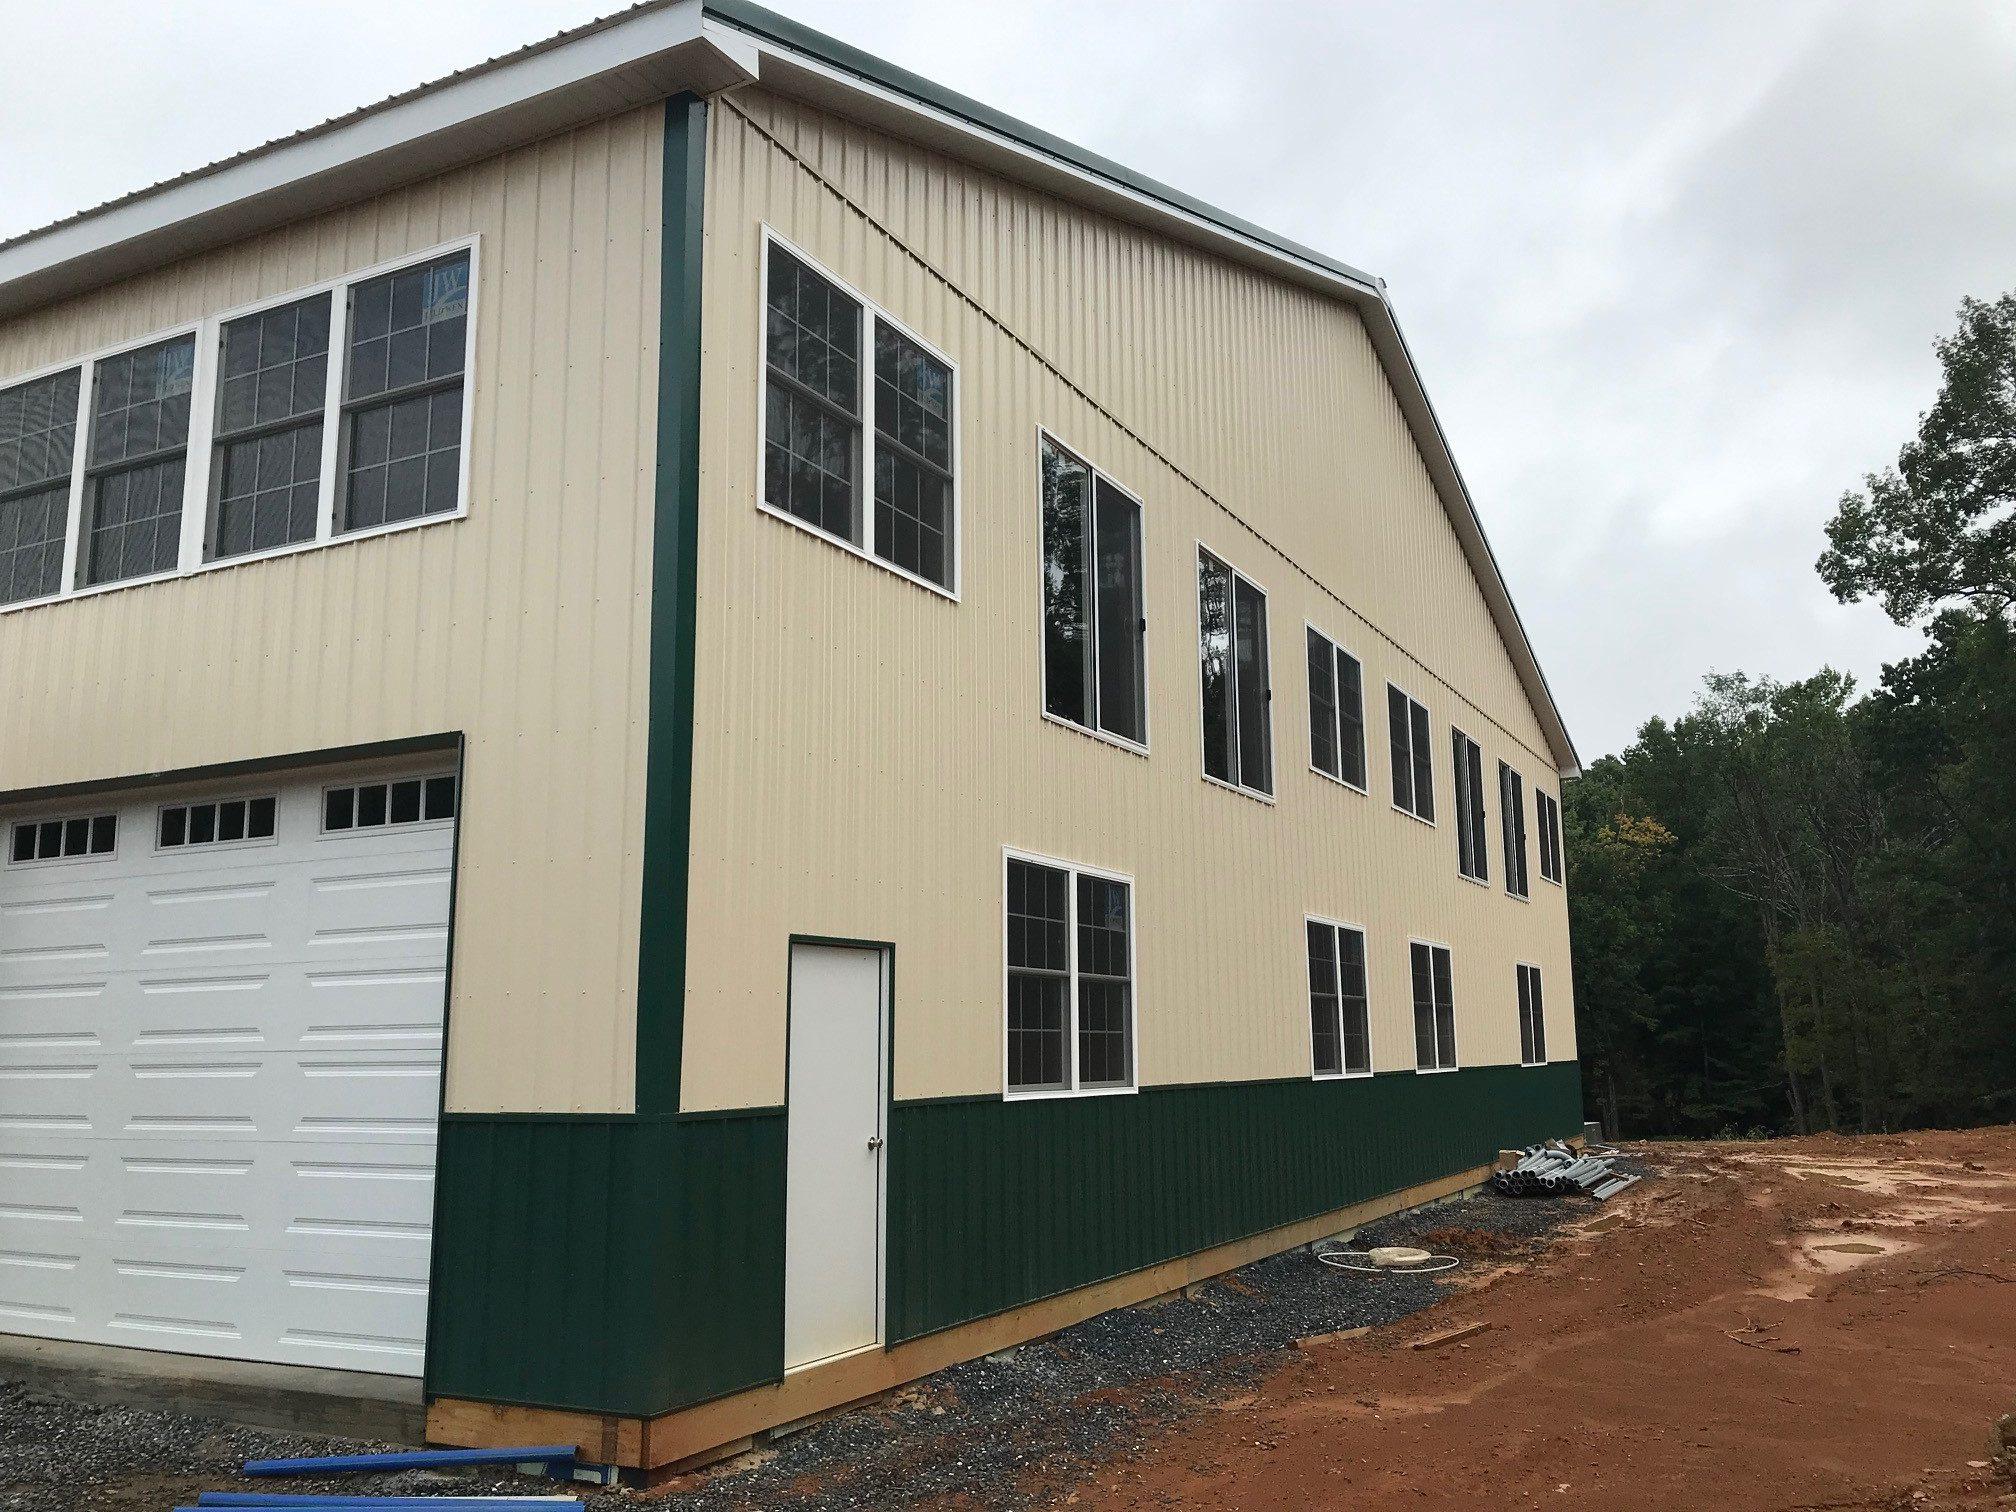 tan and green metal siding on new pole barn garage